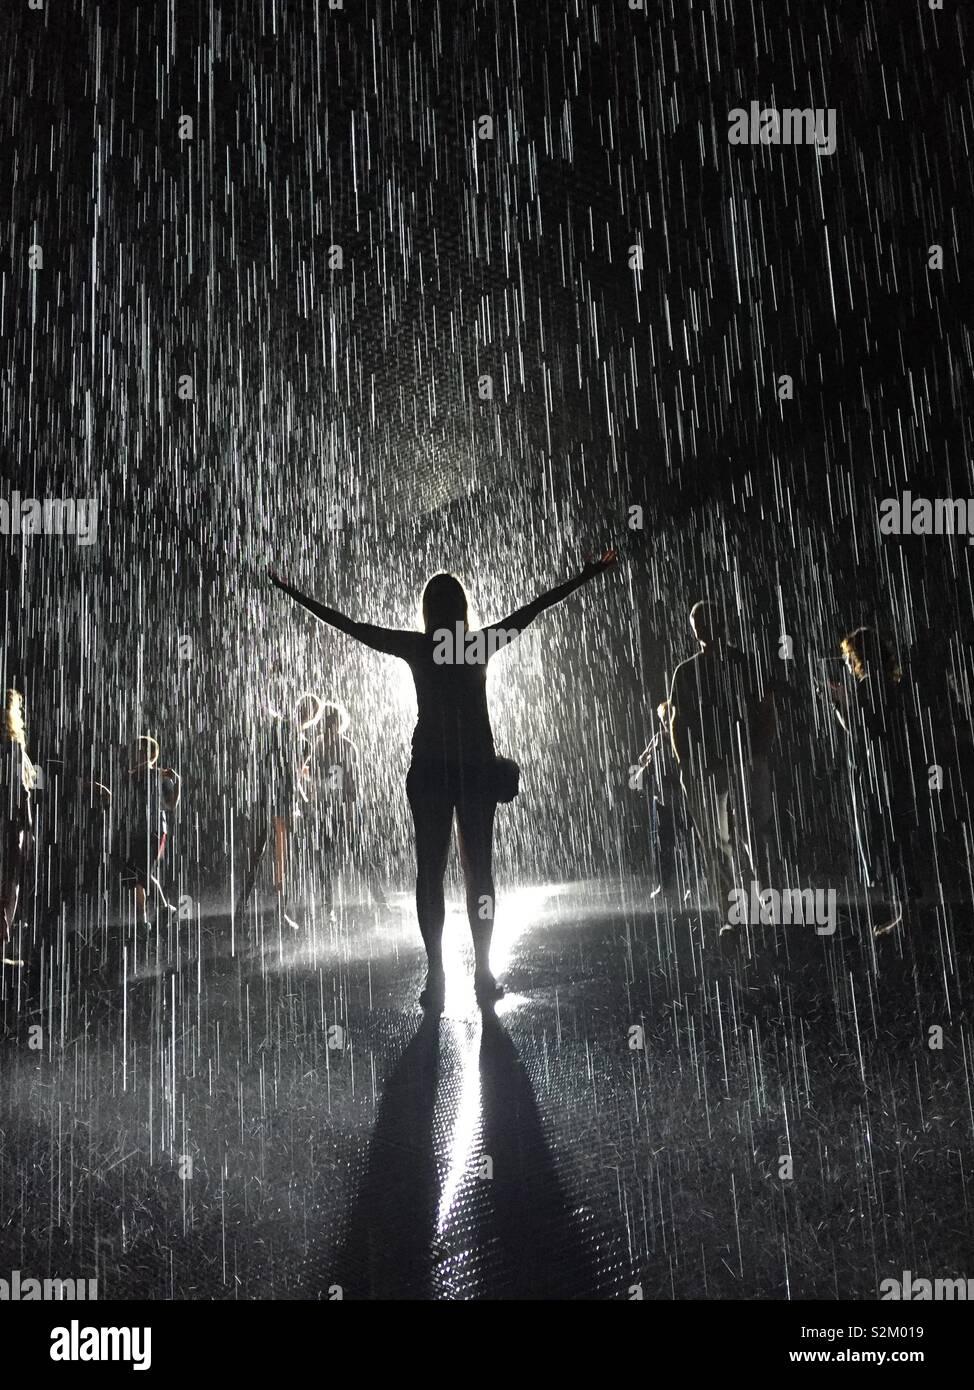 Woman standing in rain room Stock Photo